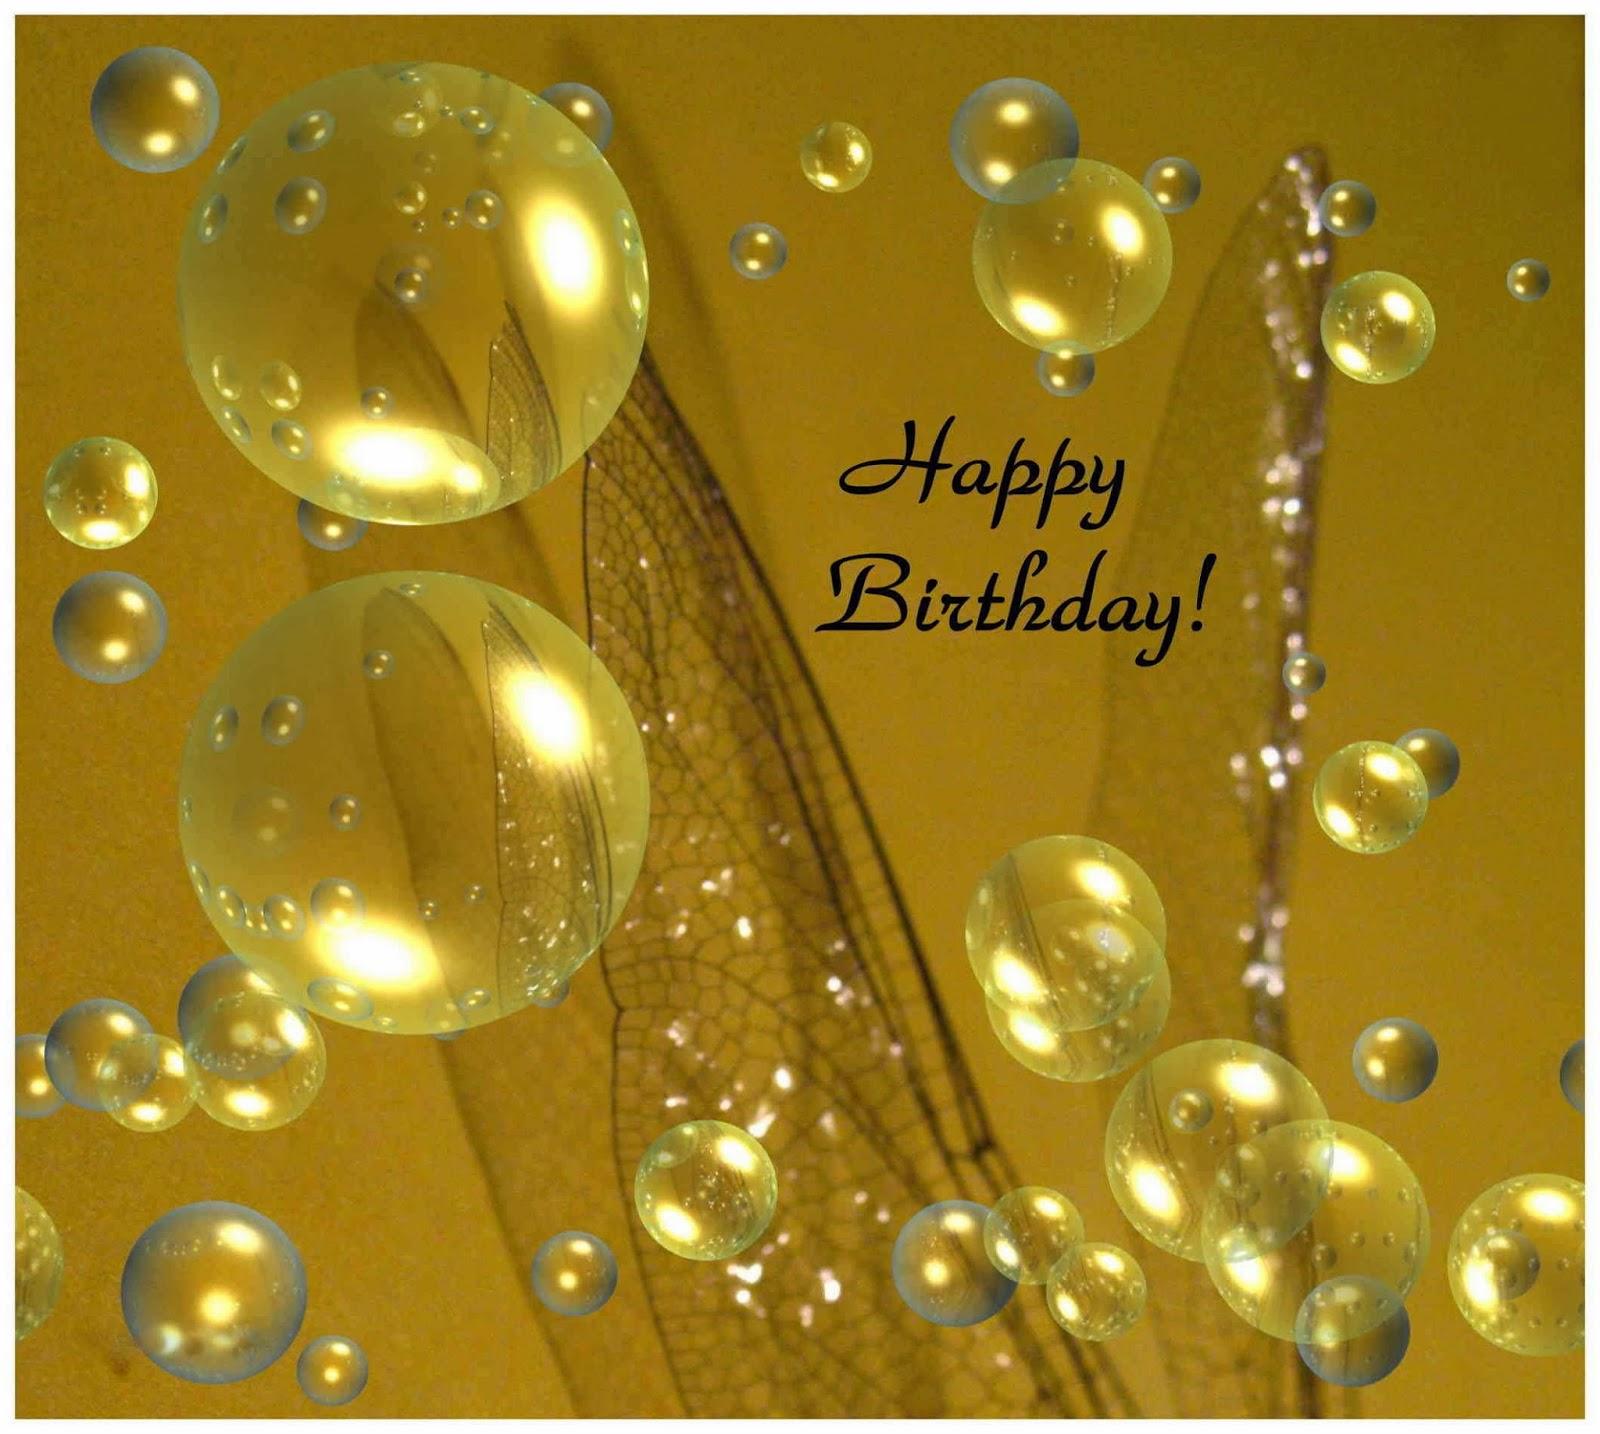 Free Download Happy Birthday Wallpaper Download Unique